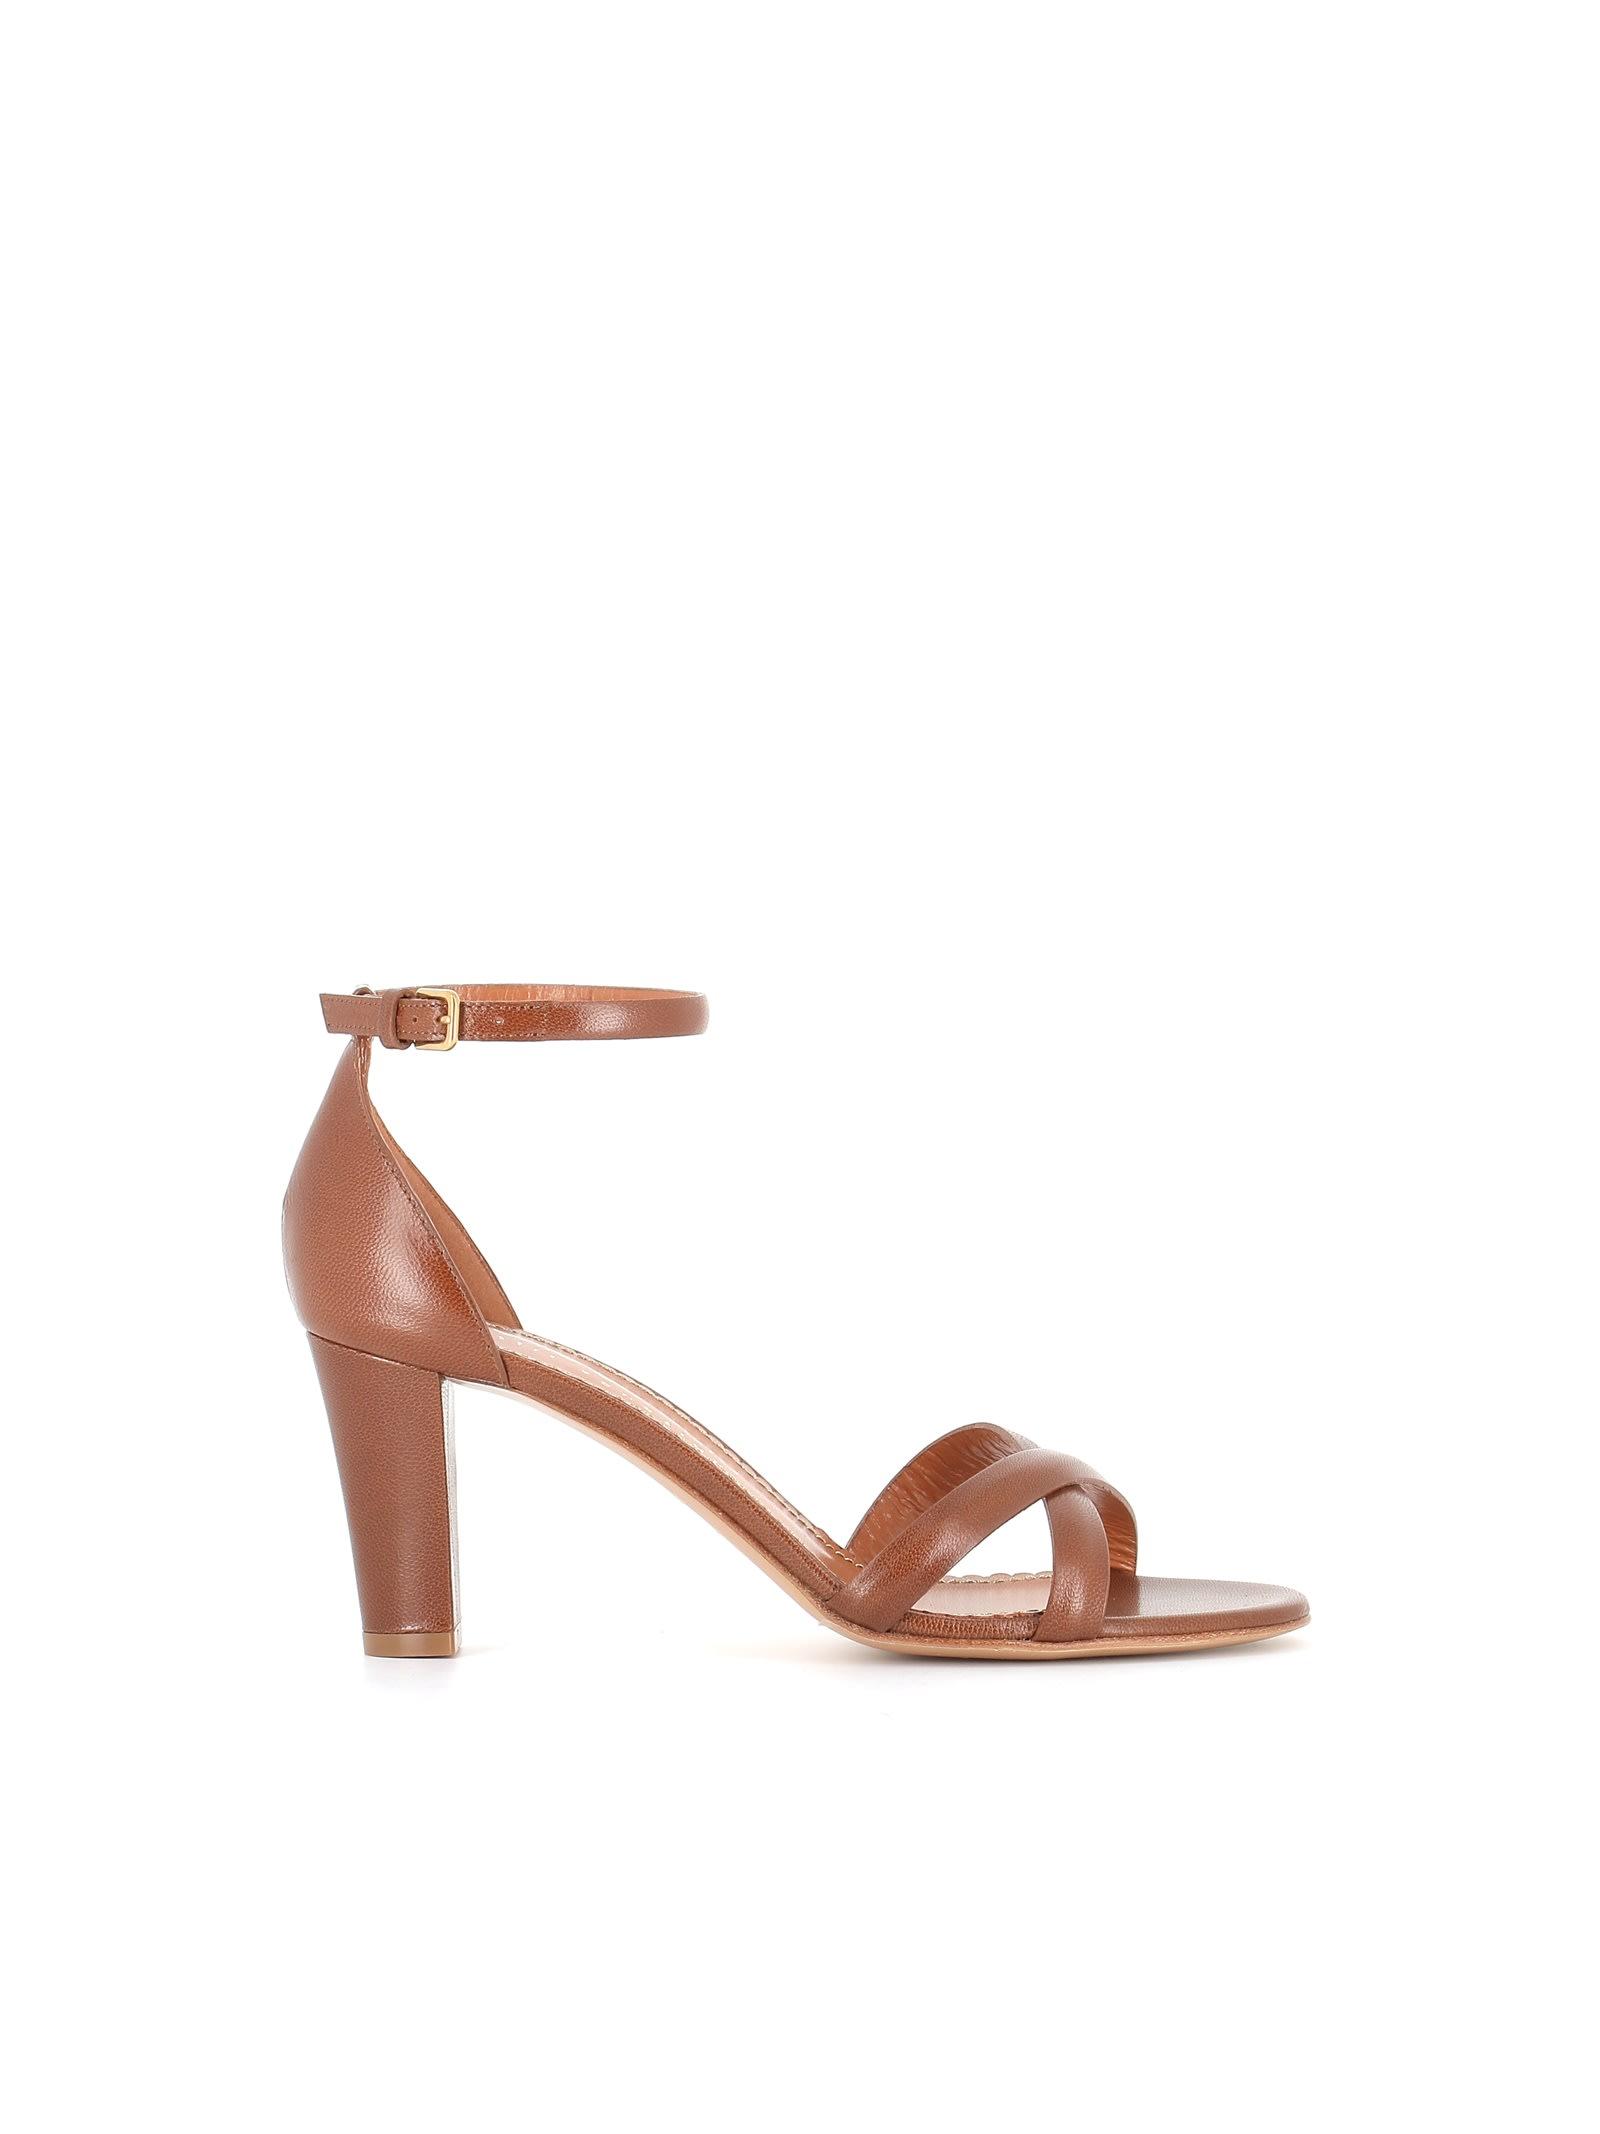 Sandal Ab1691